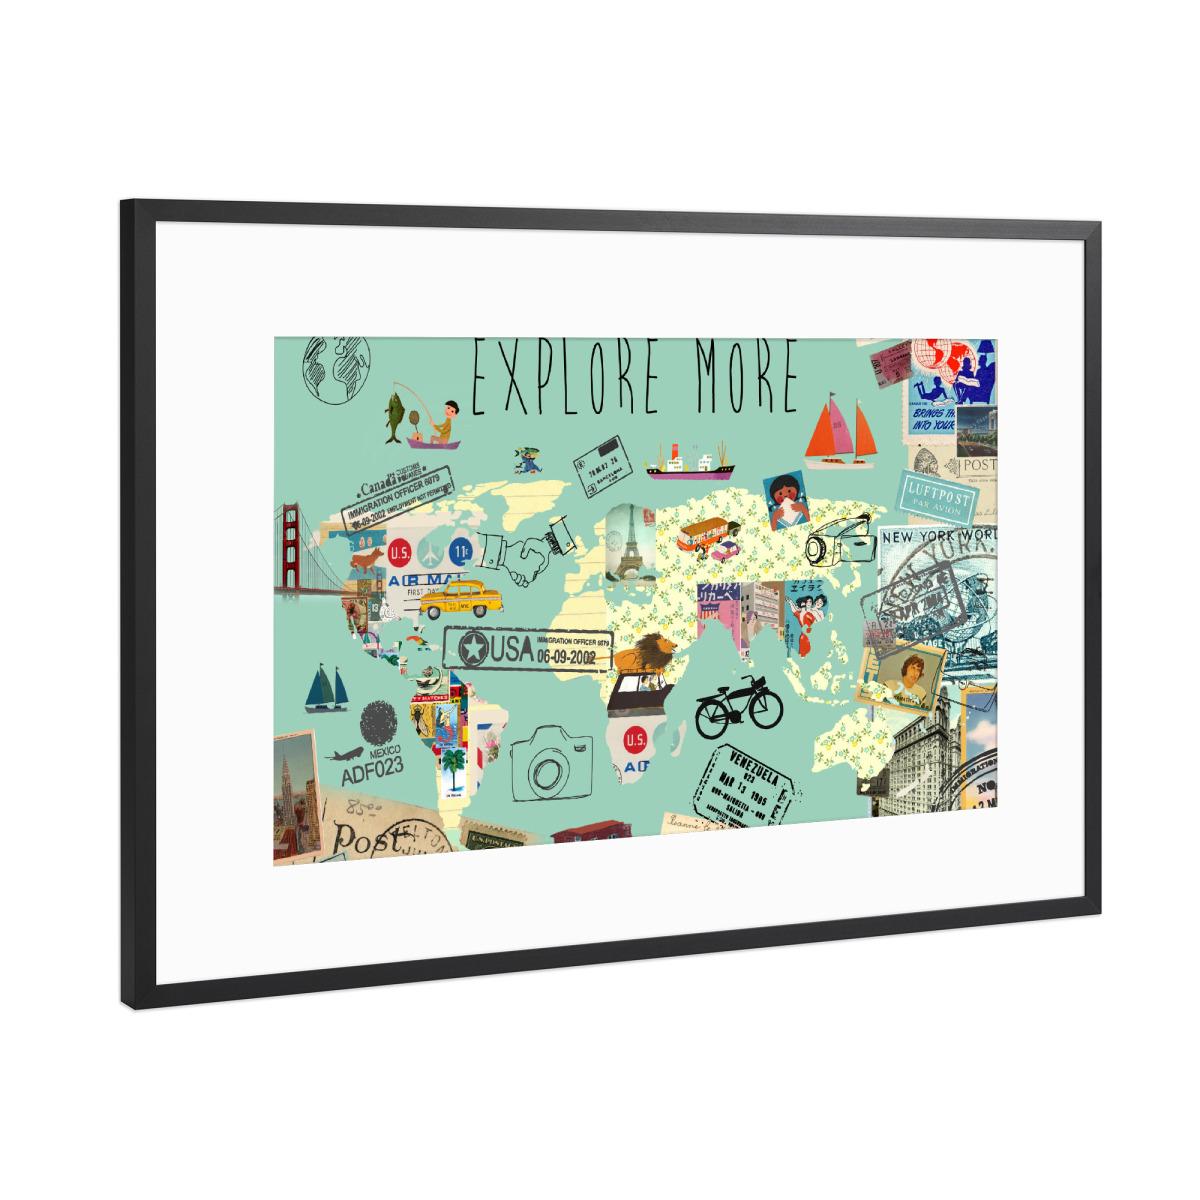 Weltkarte - Explore more als Gerahmt bei artboxONE kaufen